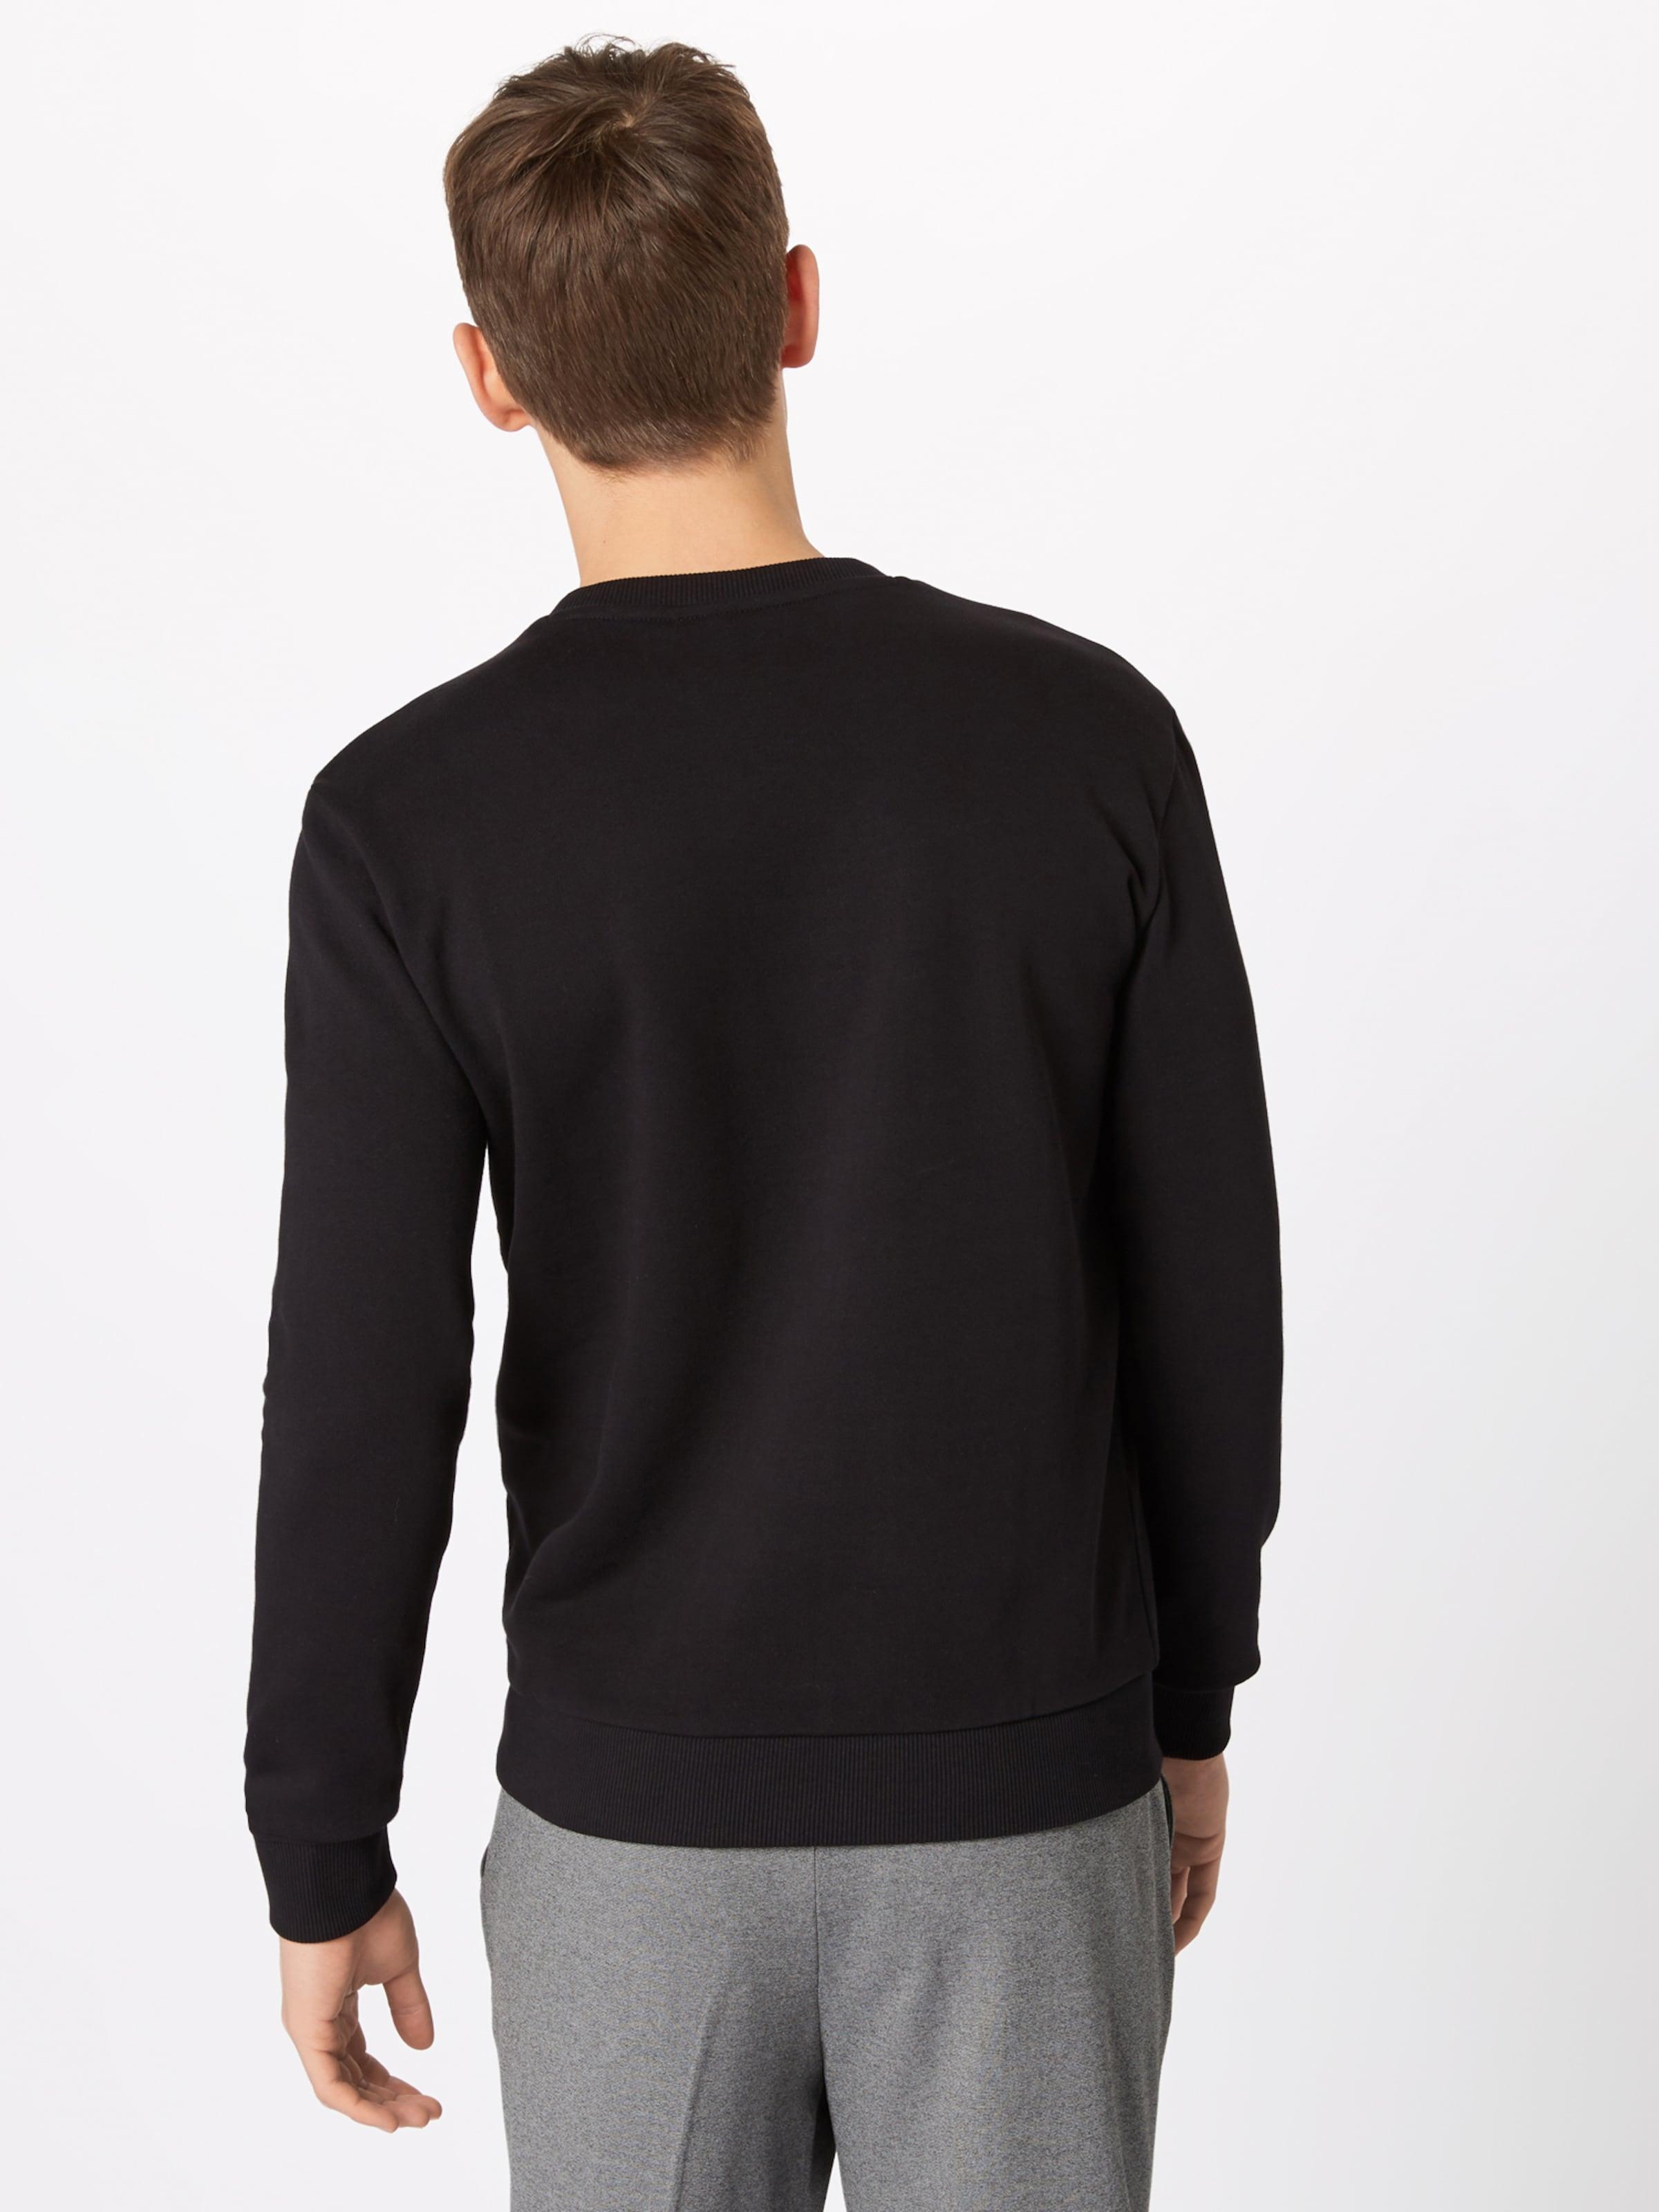 En Hugo Sweat shirt Noir u2' 'drick vNwnm08